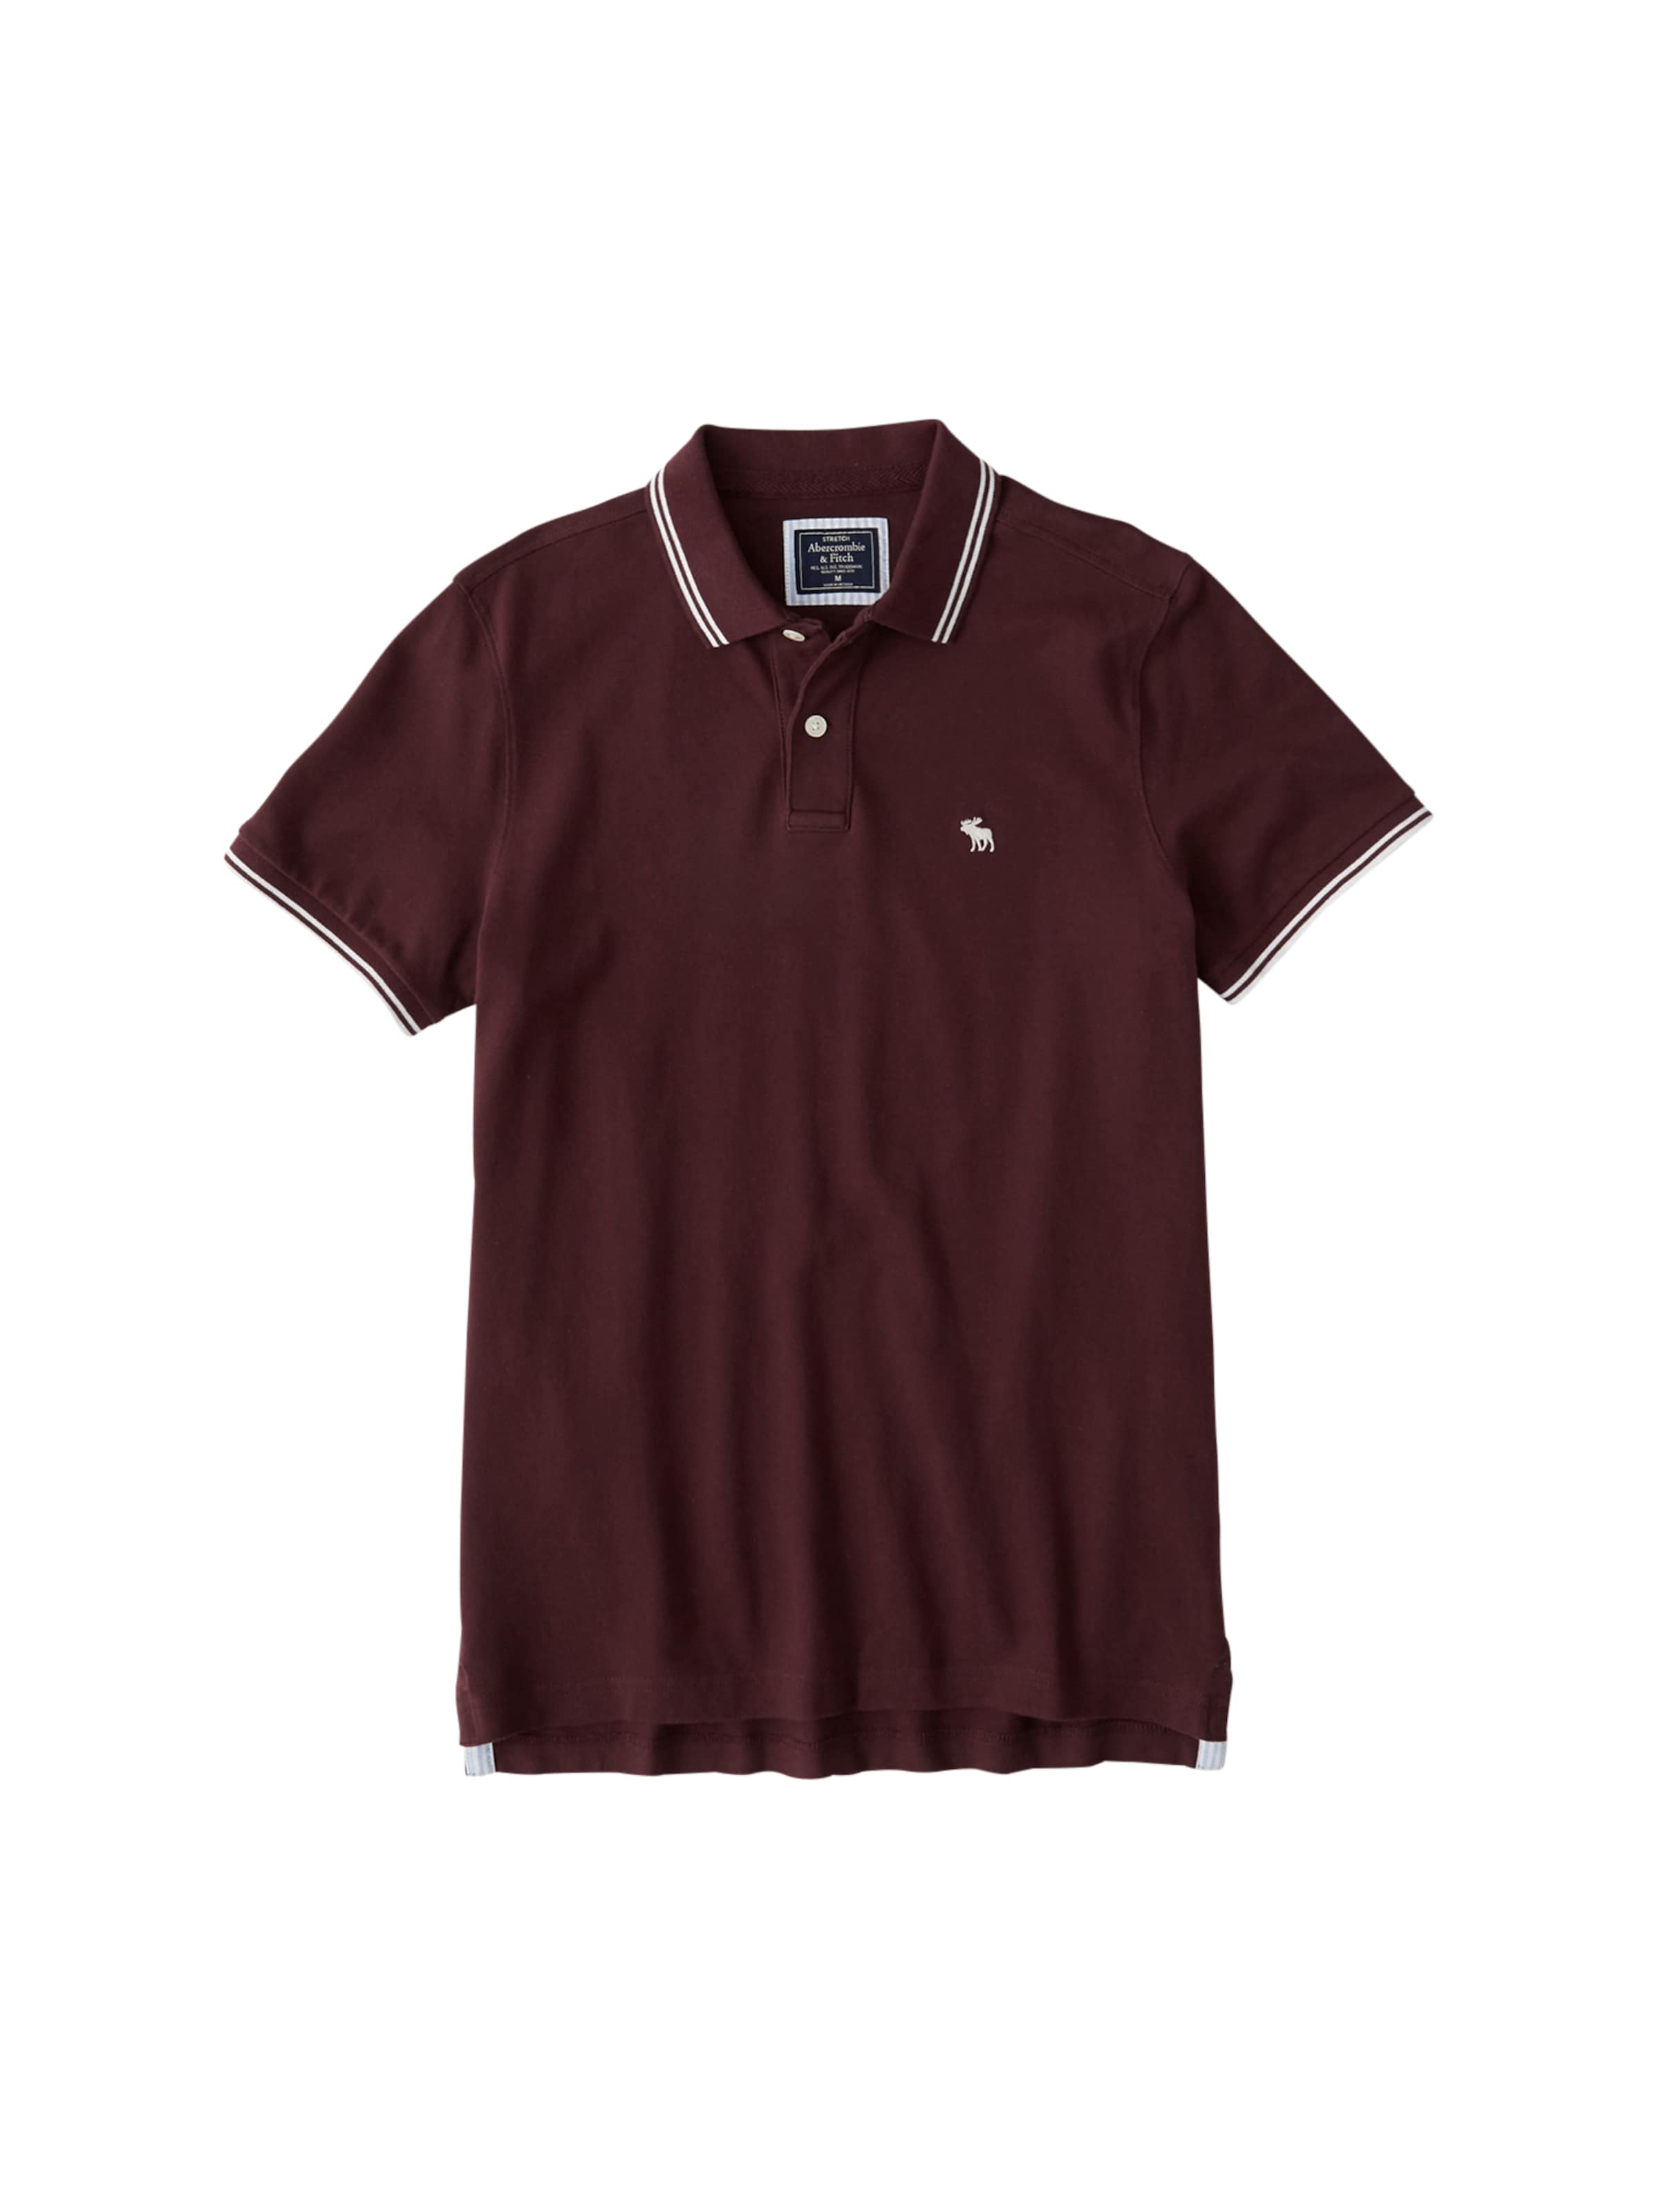 Abercrombieamp; shirt Bourgogne Fitch T En oWrCxBde